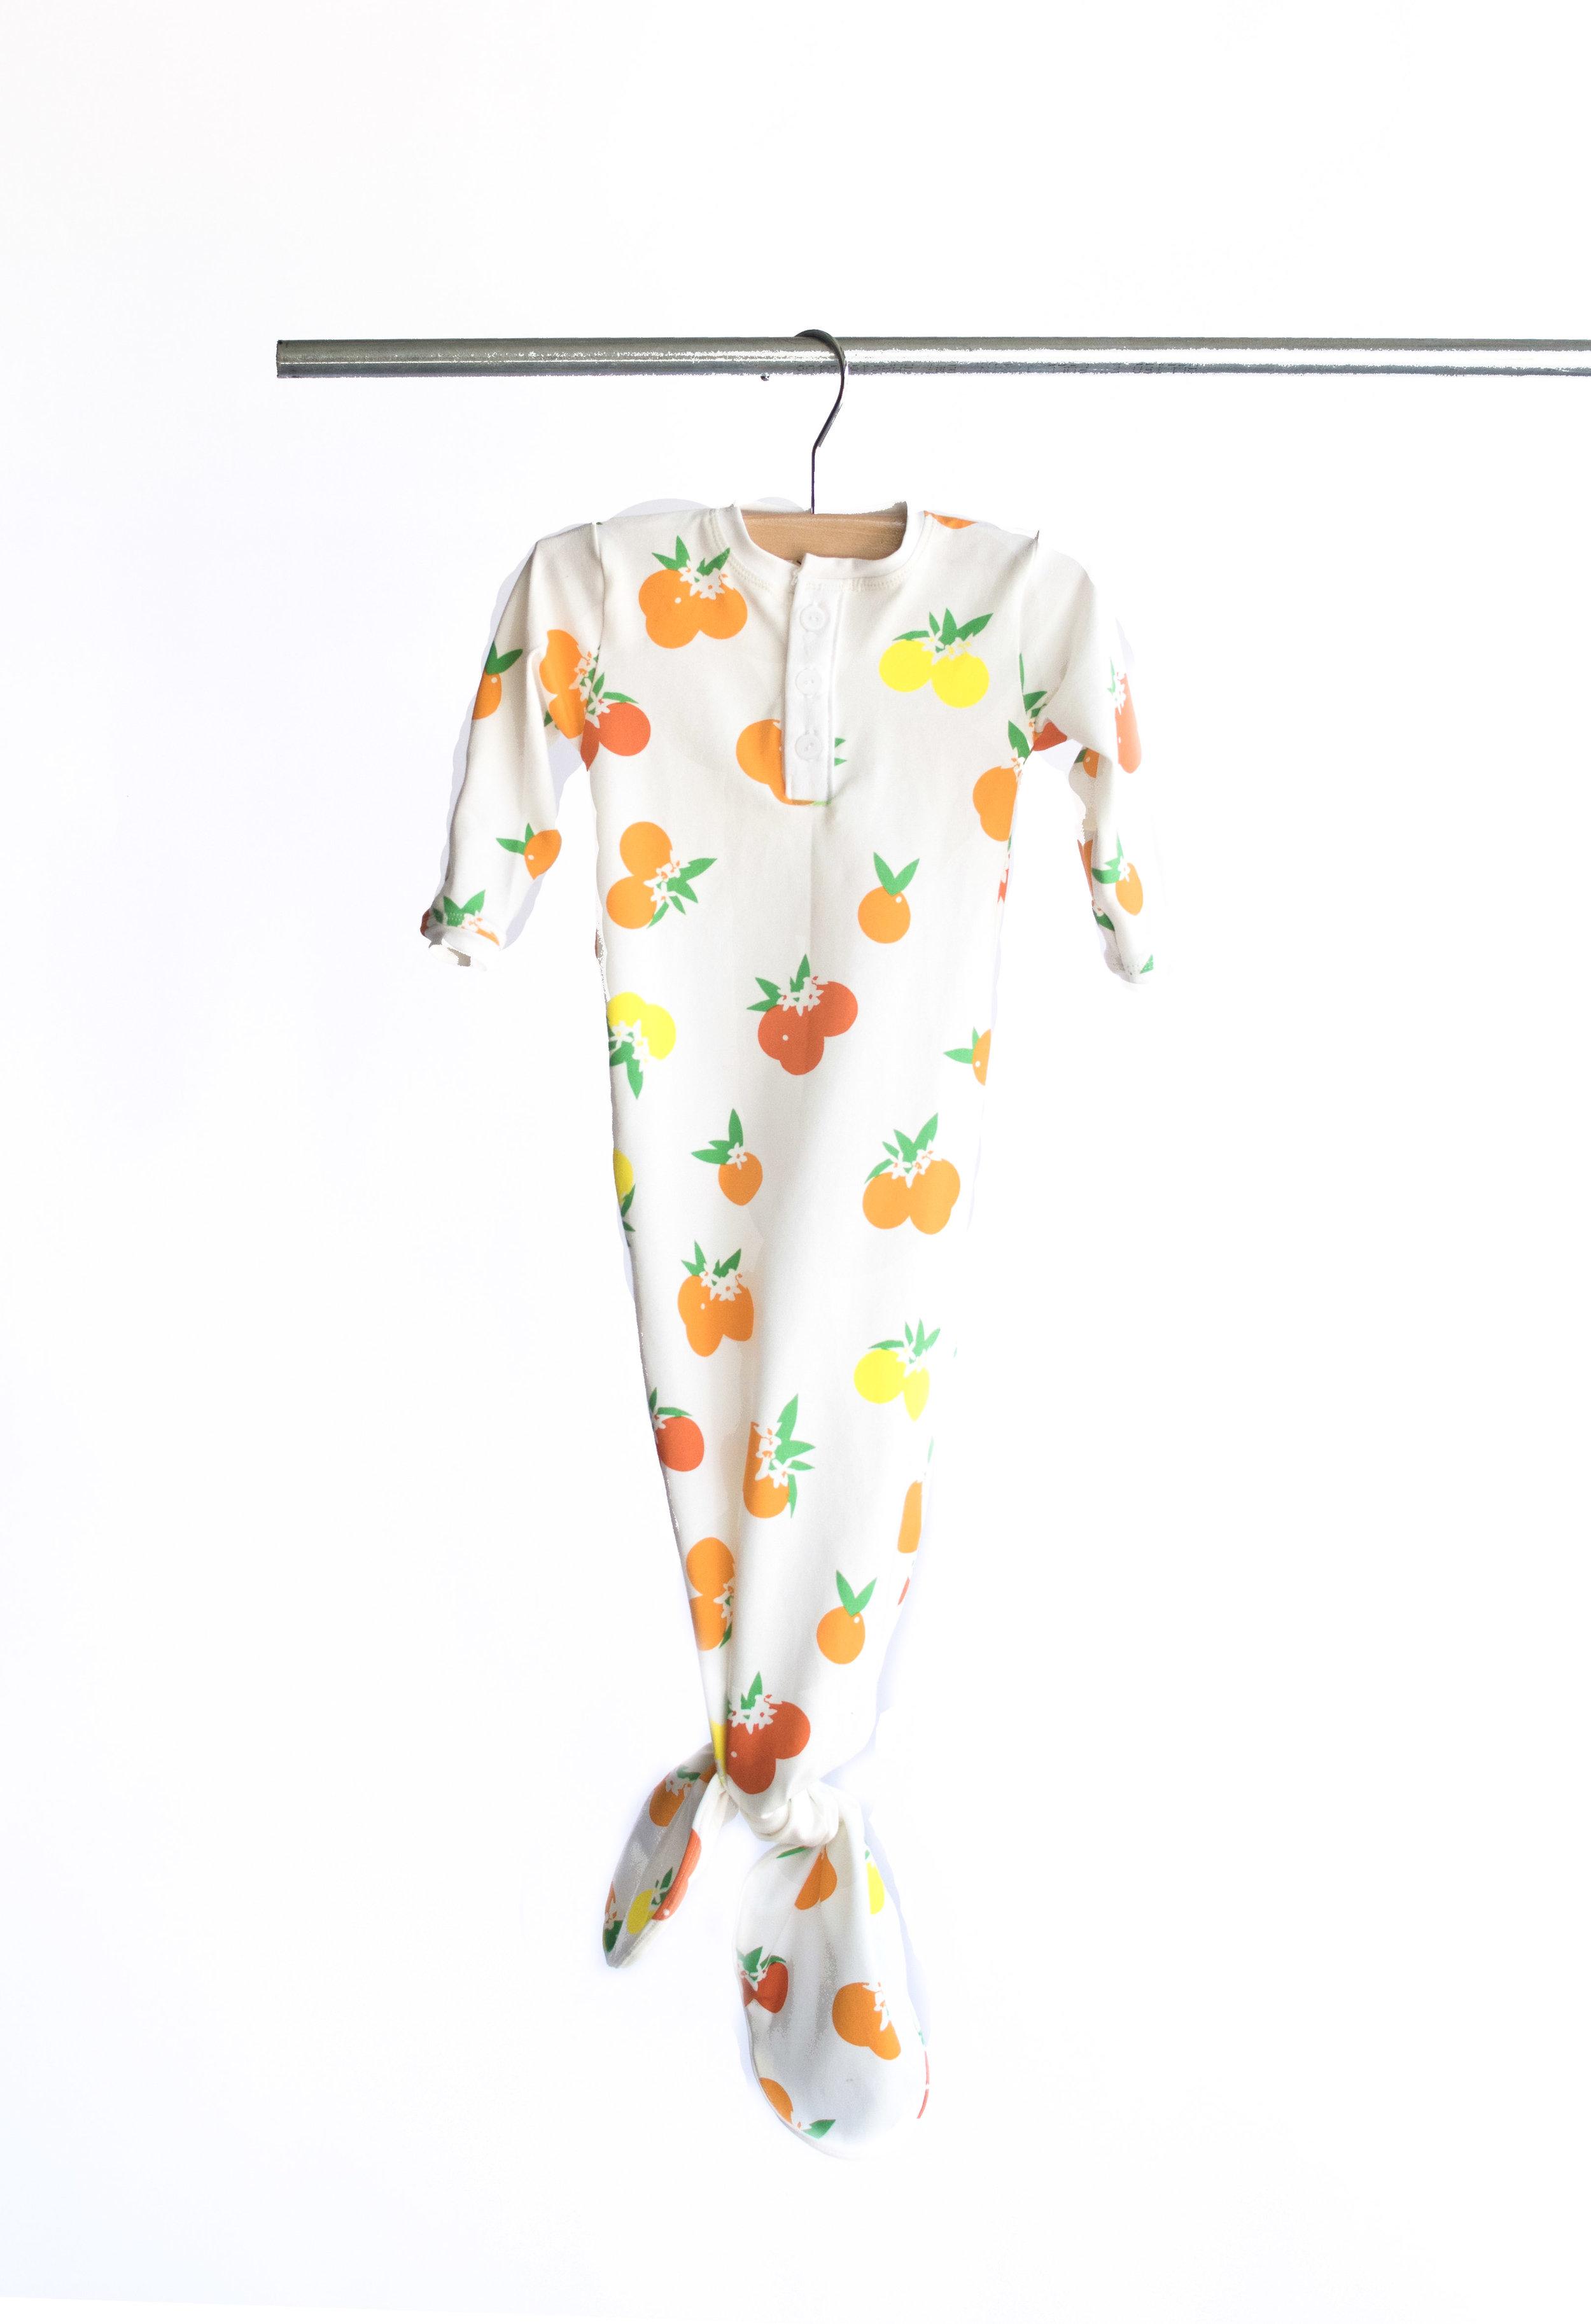 gown3.jpg